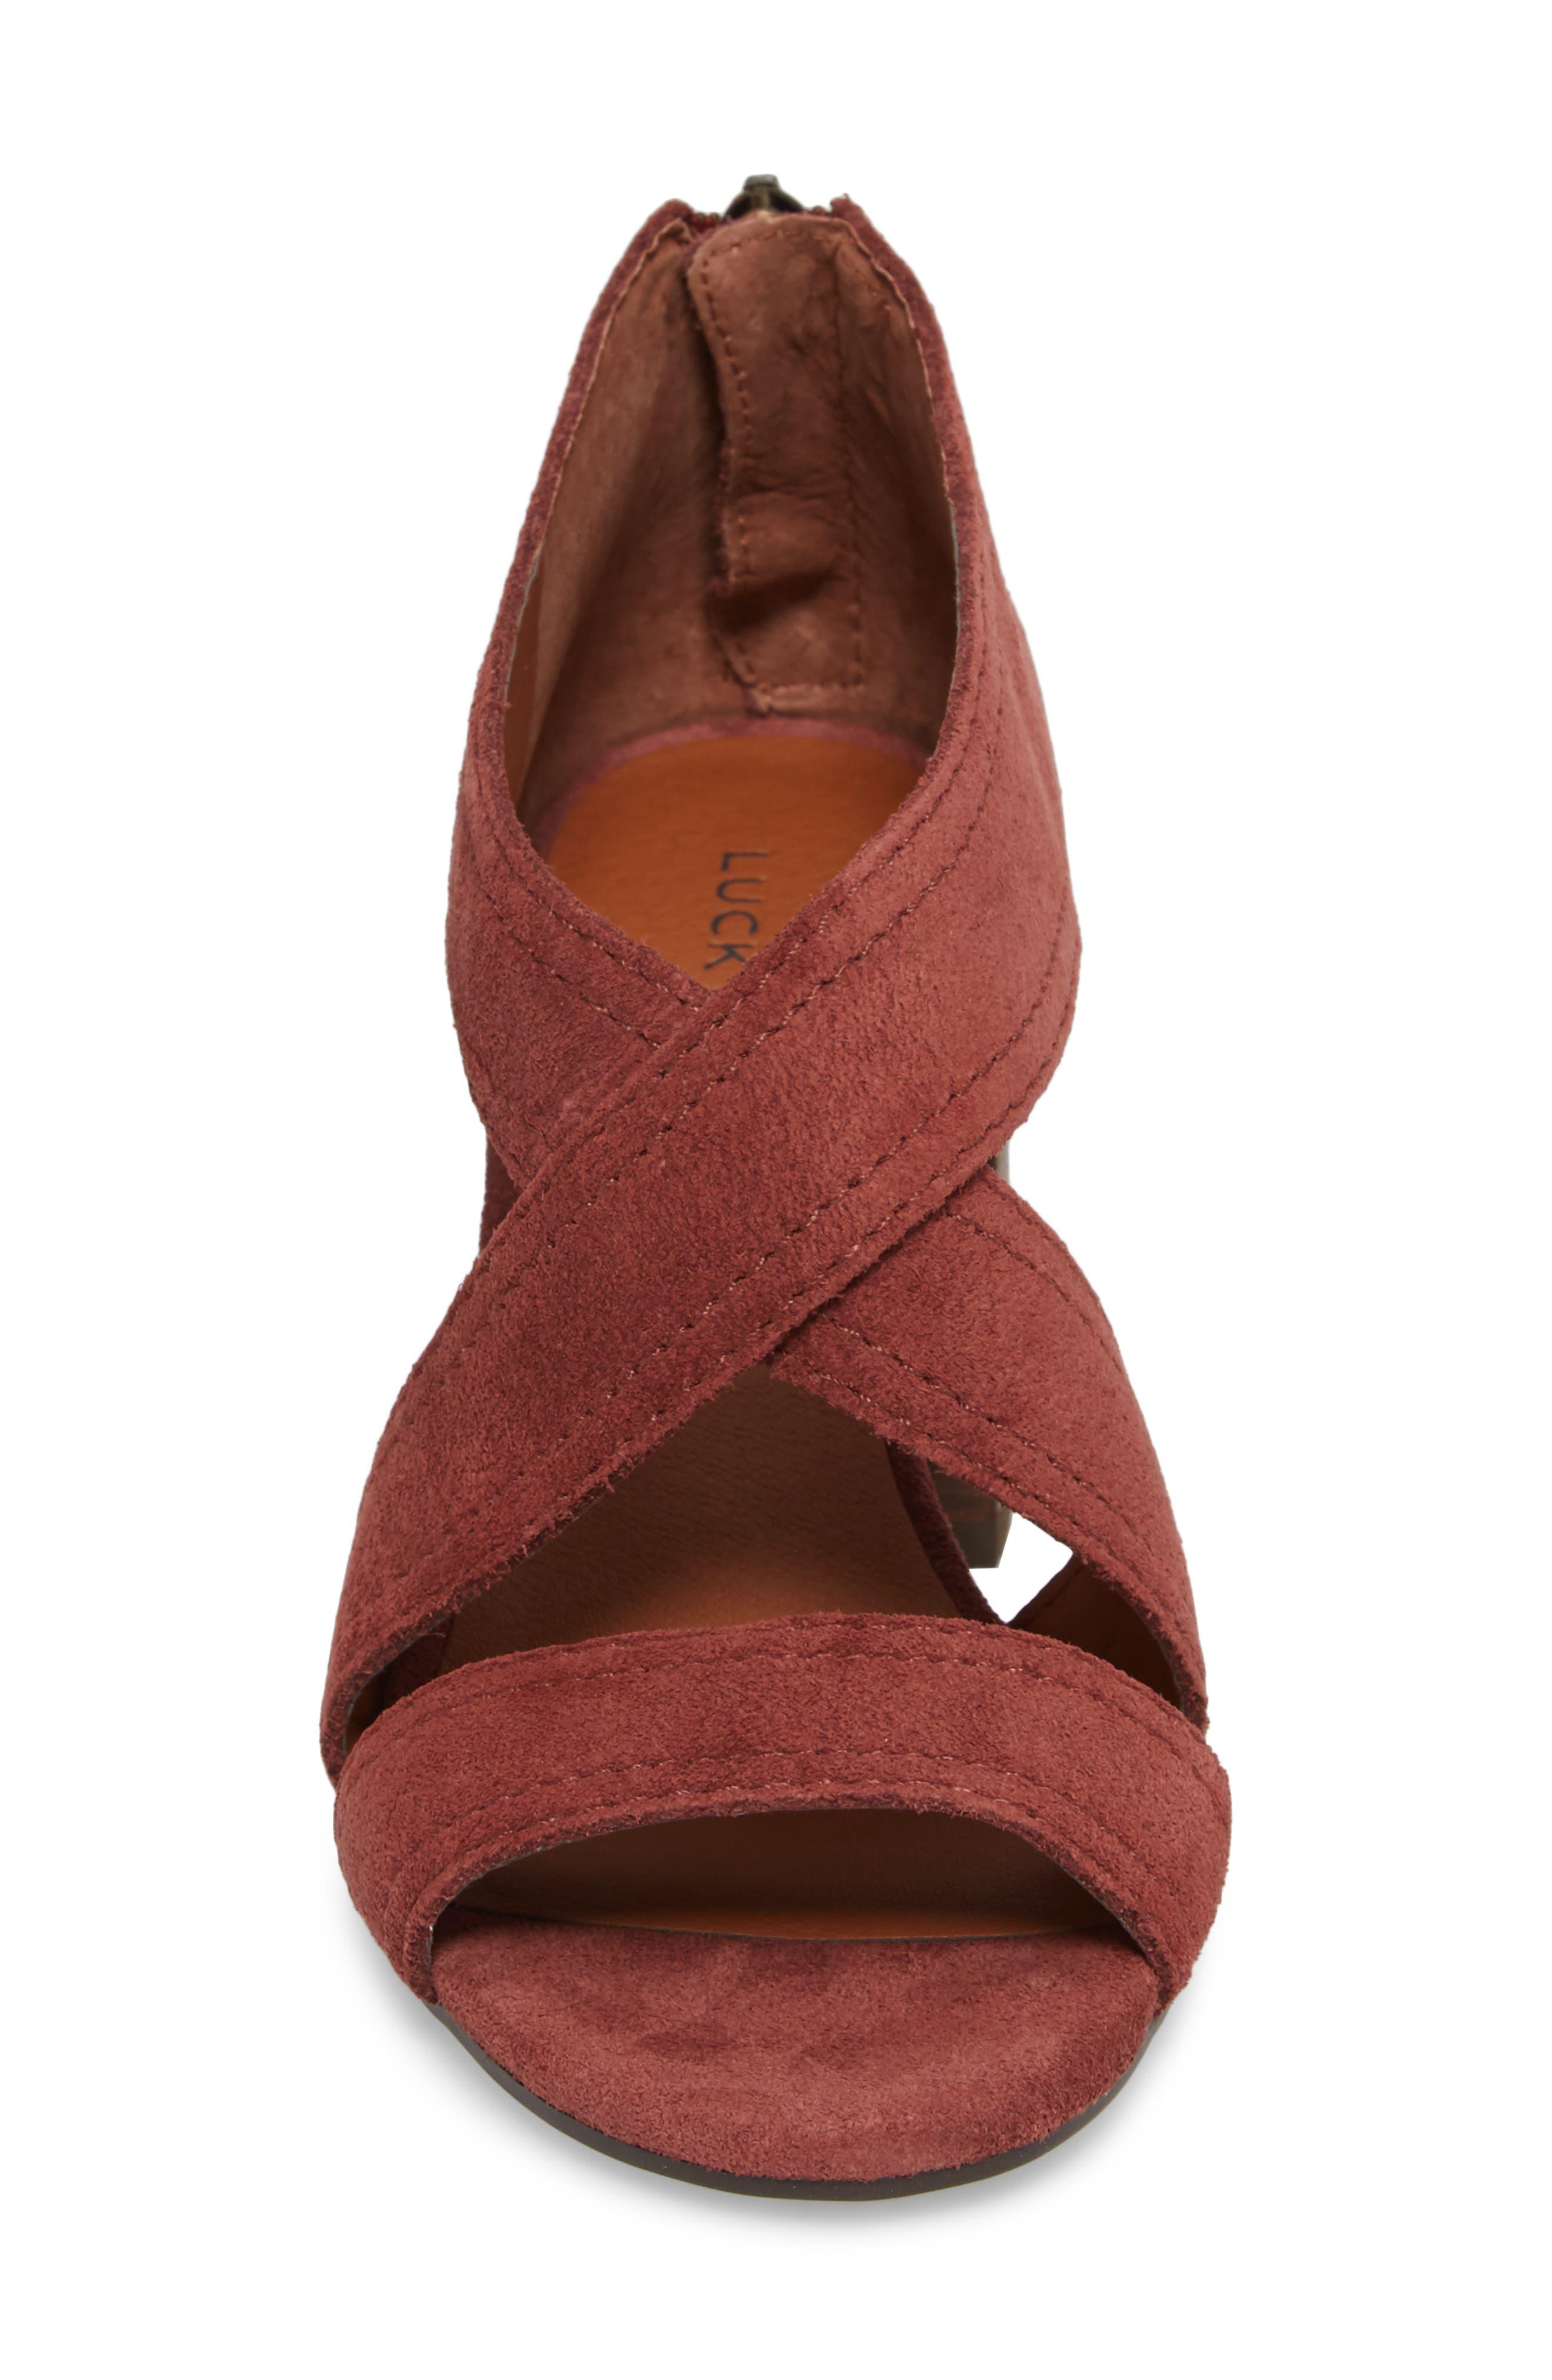 Vidva Strappy Sandal,                             Alternate thumbnail 4, color,                             Burgundy Suede